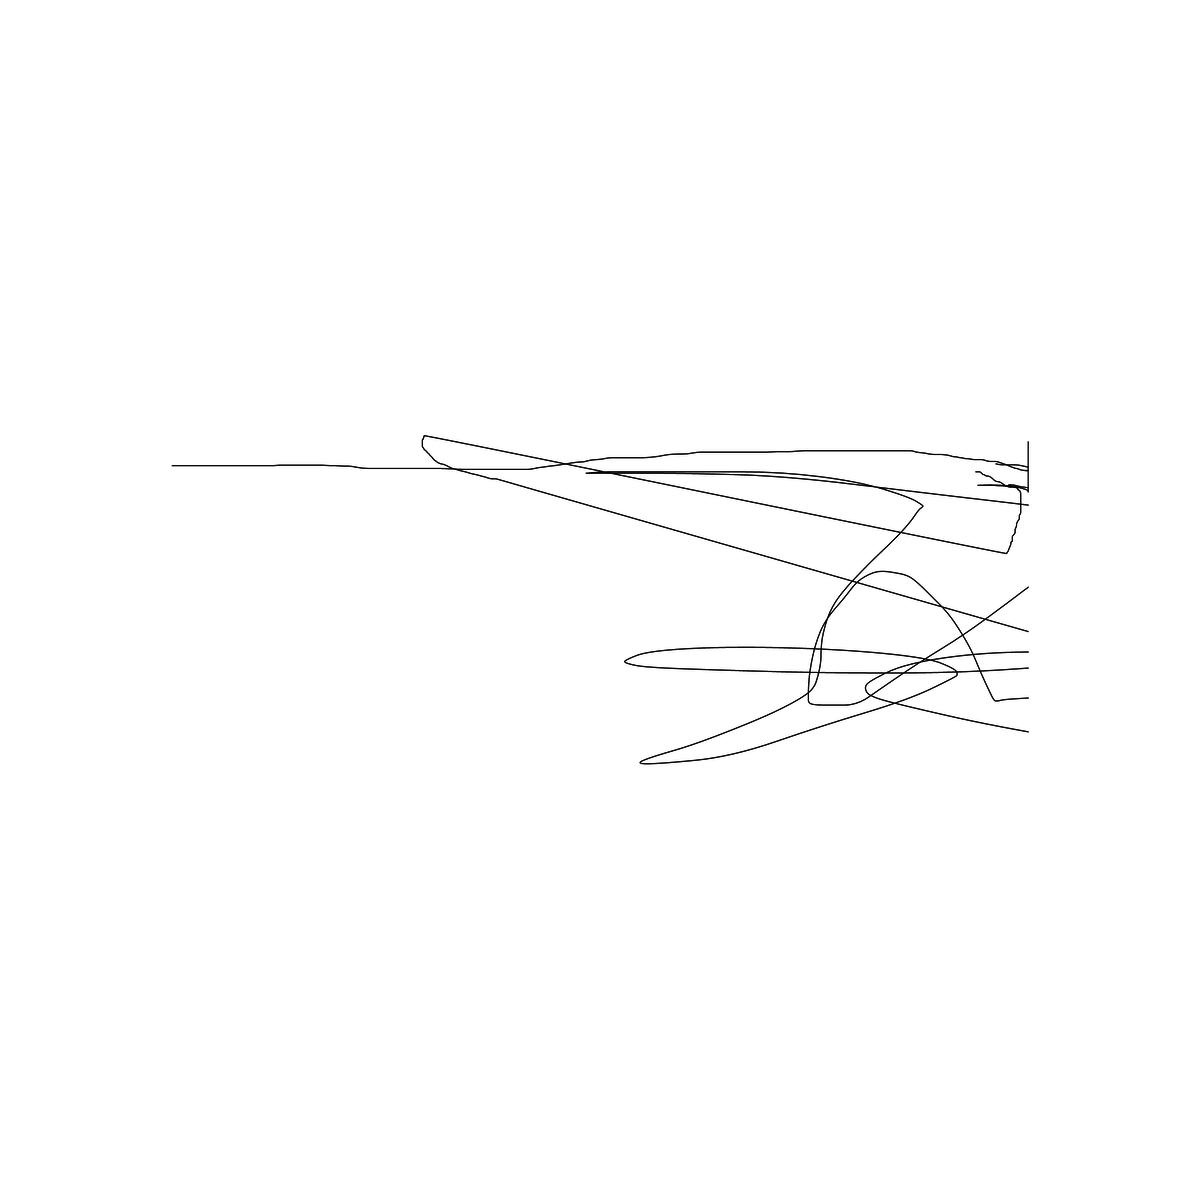 BAAAM drawing#865 lat:53.4074134826660160lng: -2.9885215759277344